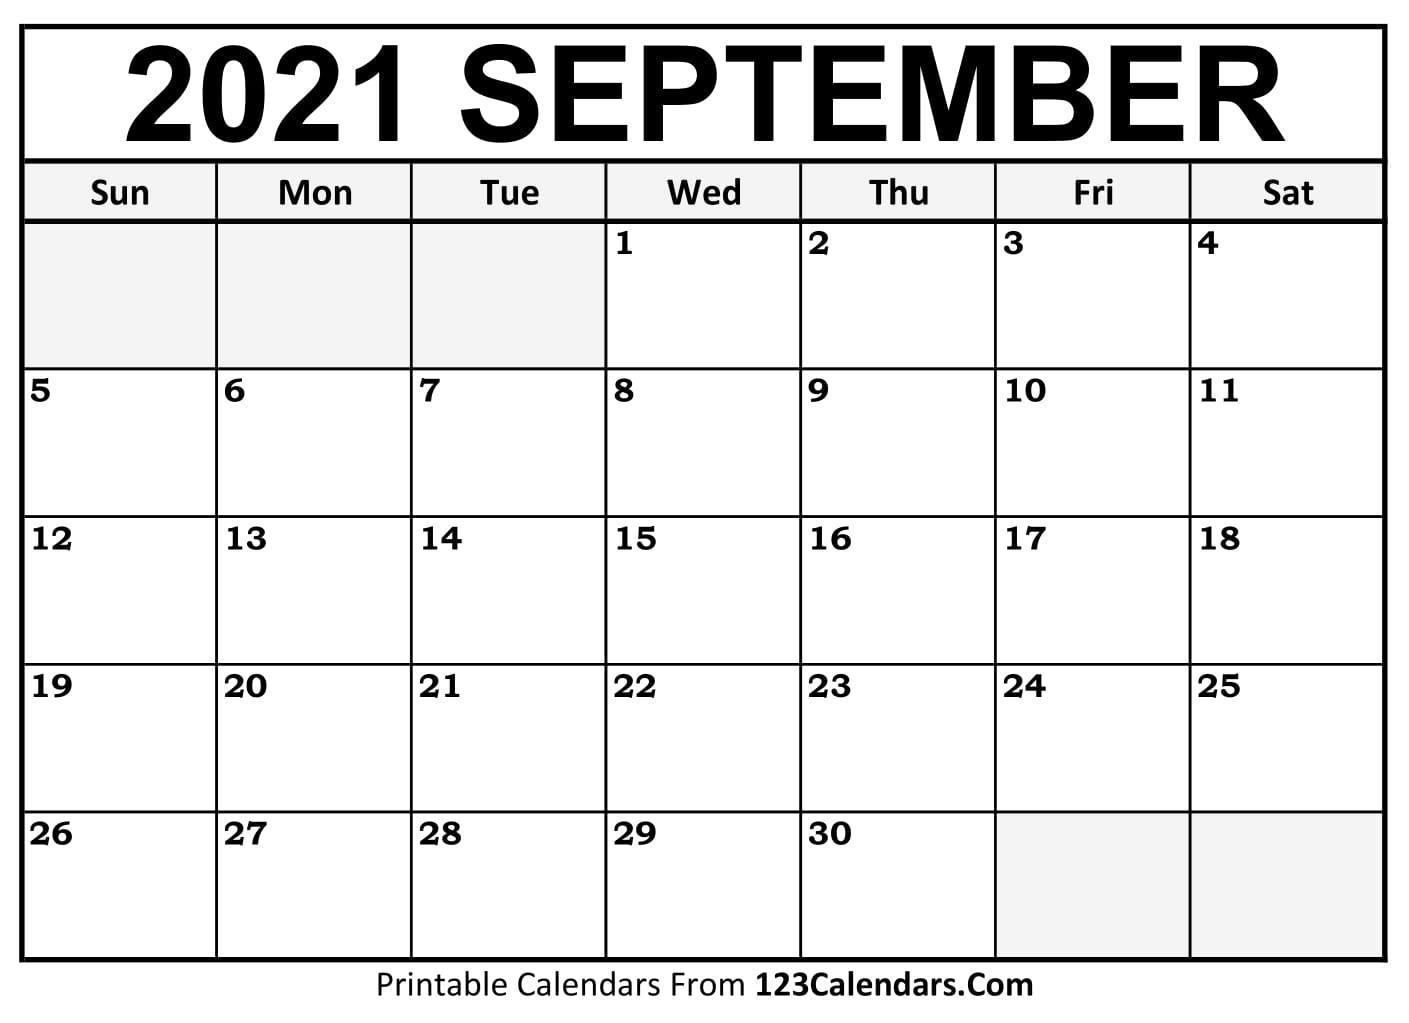 Printable September 2021 Calendar Templates | 123Calendars Printable September 2021 Calendar